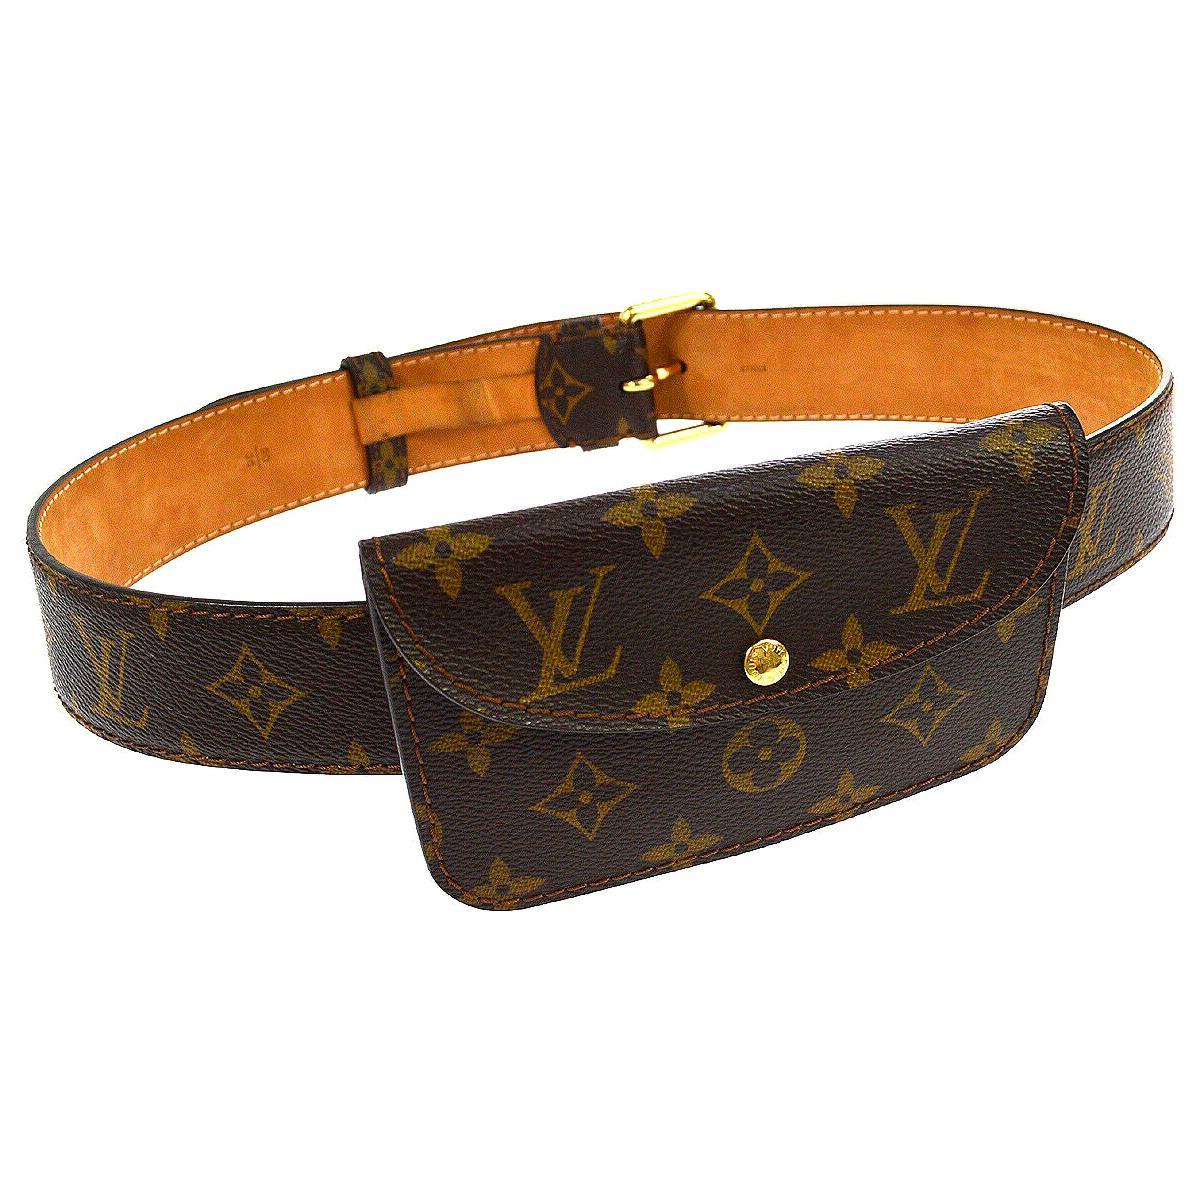 Louis Vuitton Monogram Men's Women's Pouch Bum Fanny Pack Waist Belt Bag